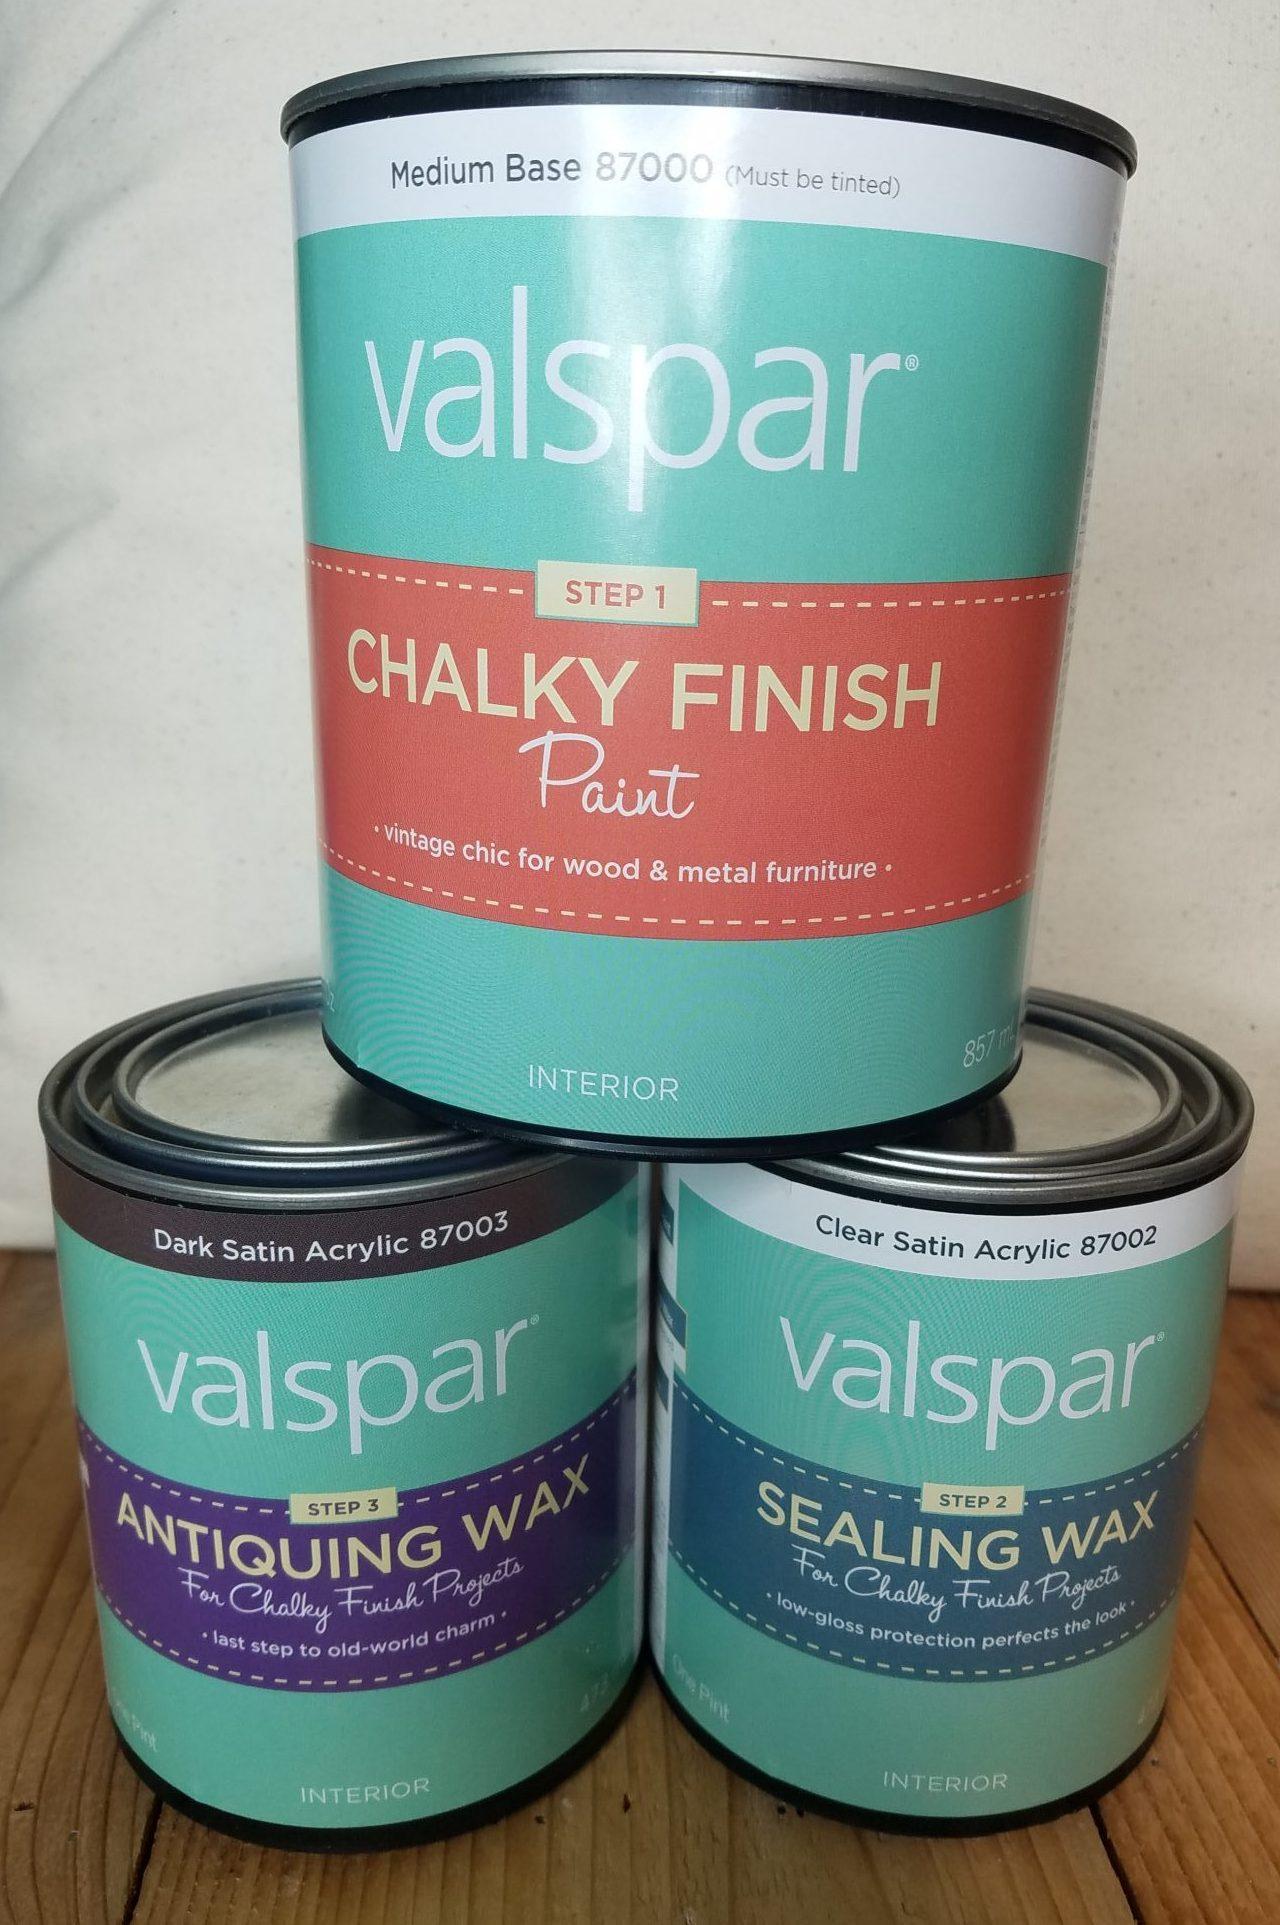 valspar chalky finish paint review the dixie lady. Black Bedroom Furniture Sets. Home Design Ideas